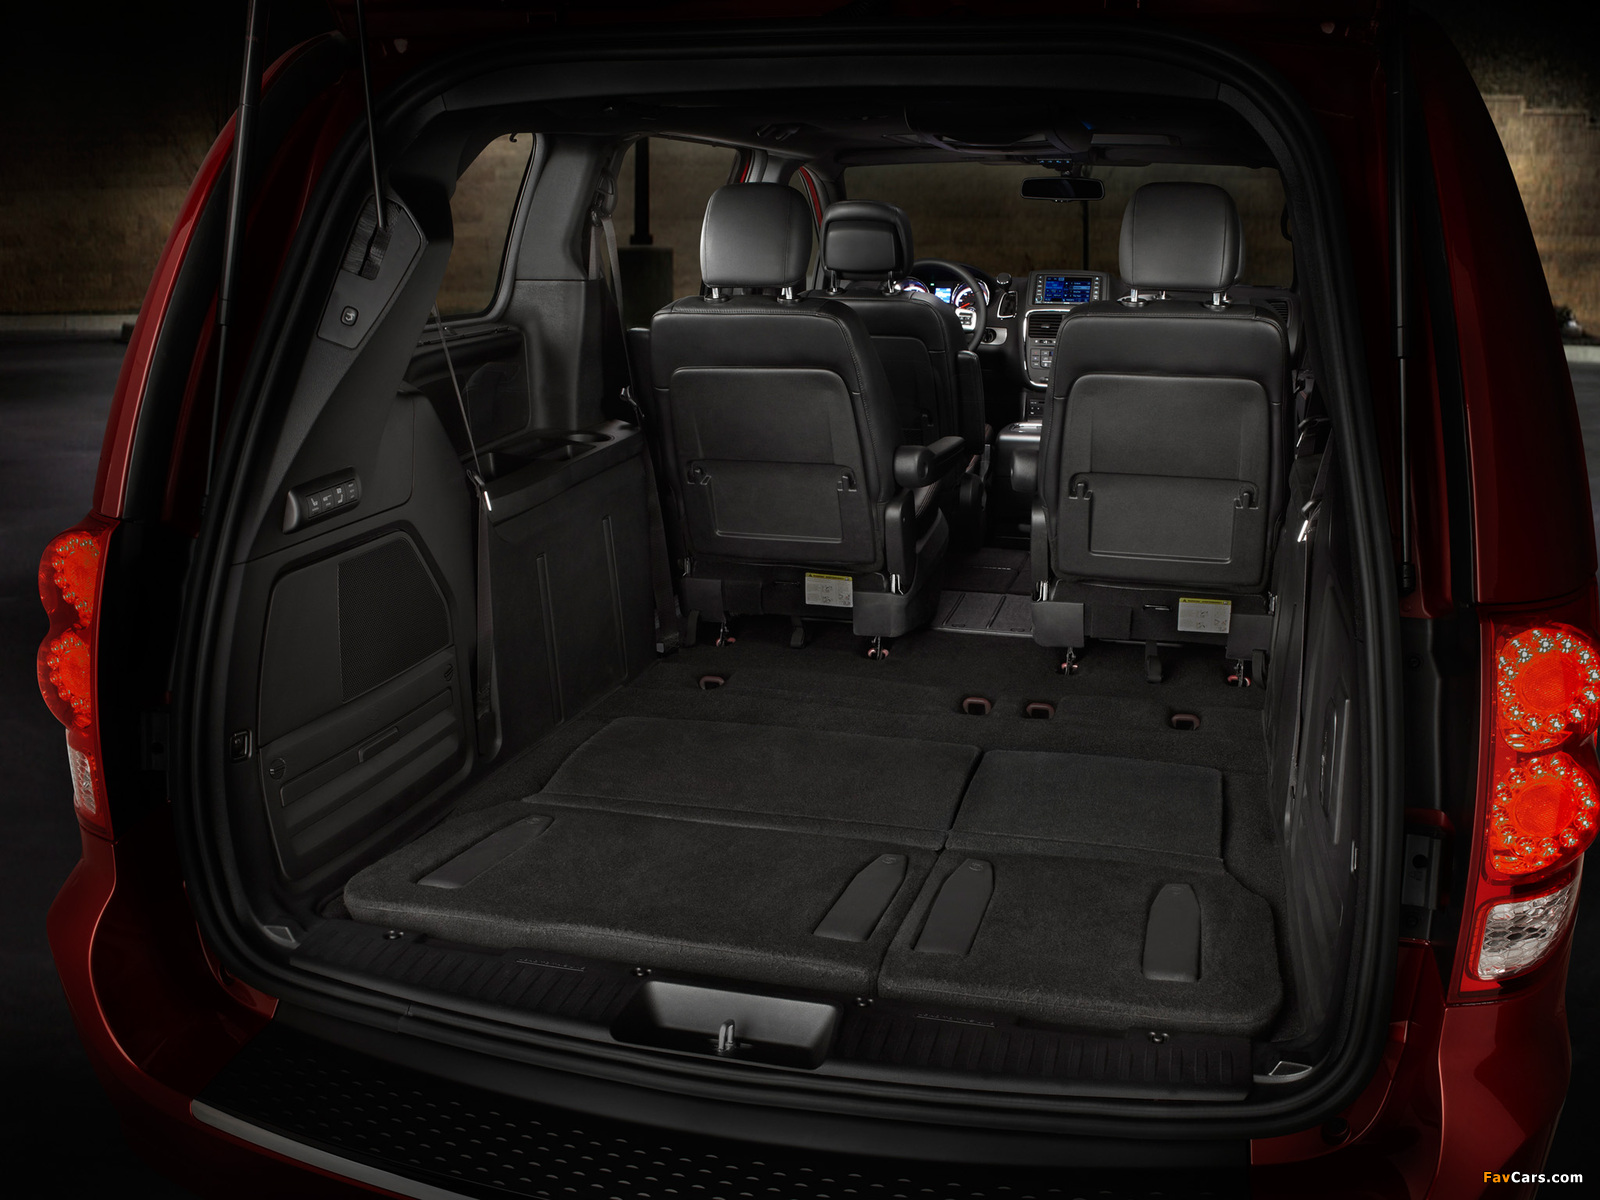 Dodge Grand Caravan R/T 2011 pictures (1600 x 1200)